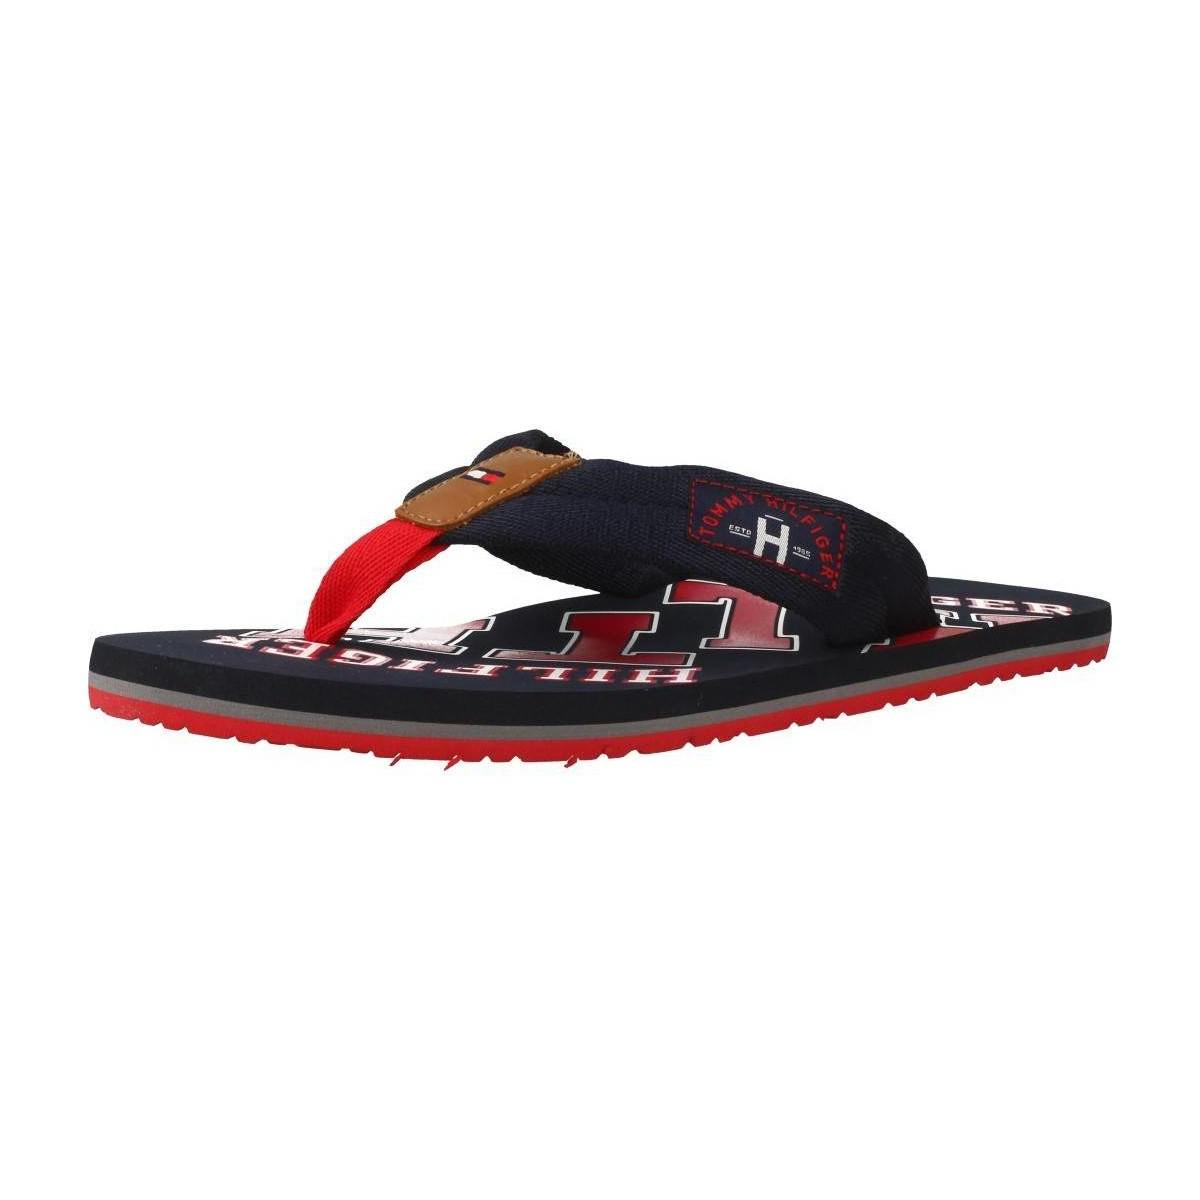 2381a52c7 Tommy Hilfiger Fm0fm01369 Men s Flip Flops   Sandals (shoes) In Blue ...